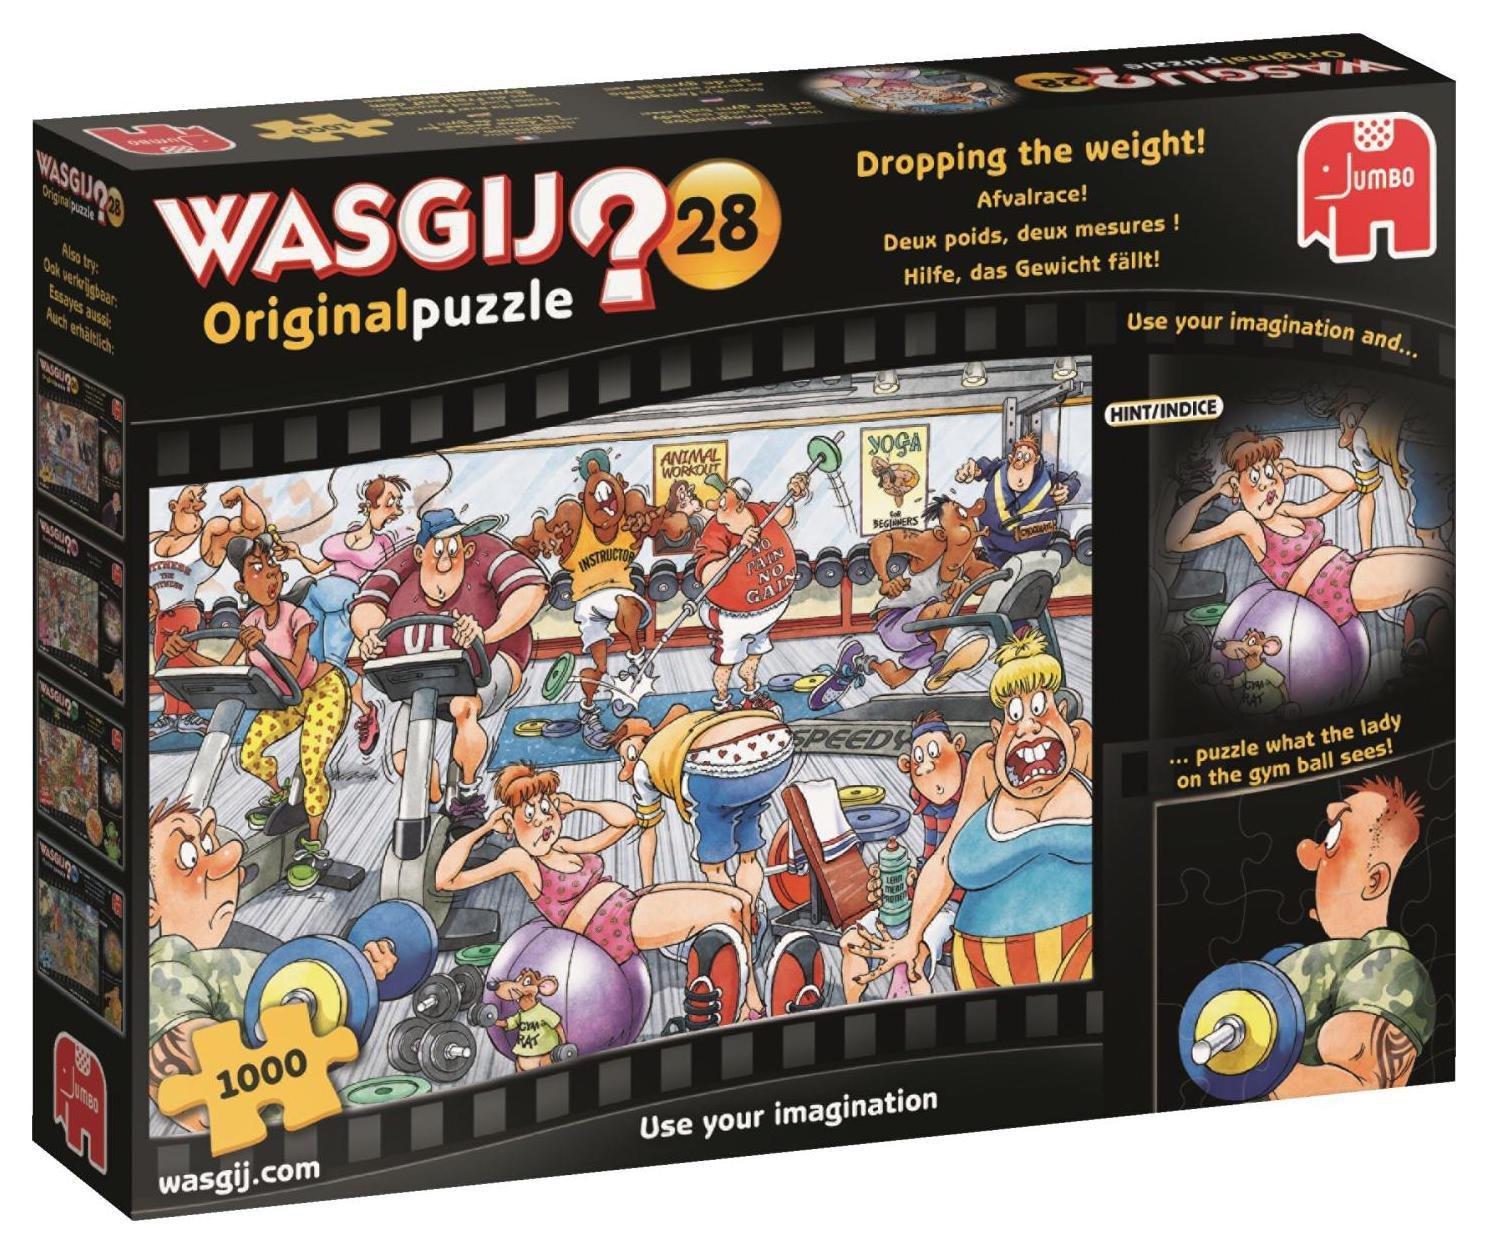 Wasgij Original 28 Brainteaser Puzzle - 1000 Piece